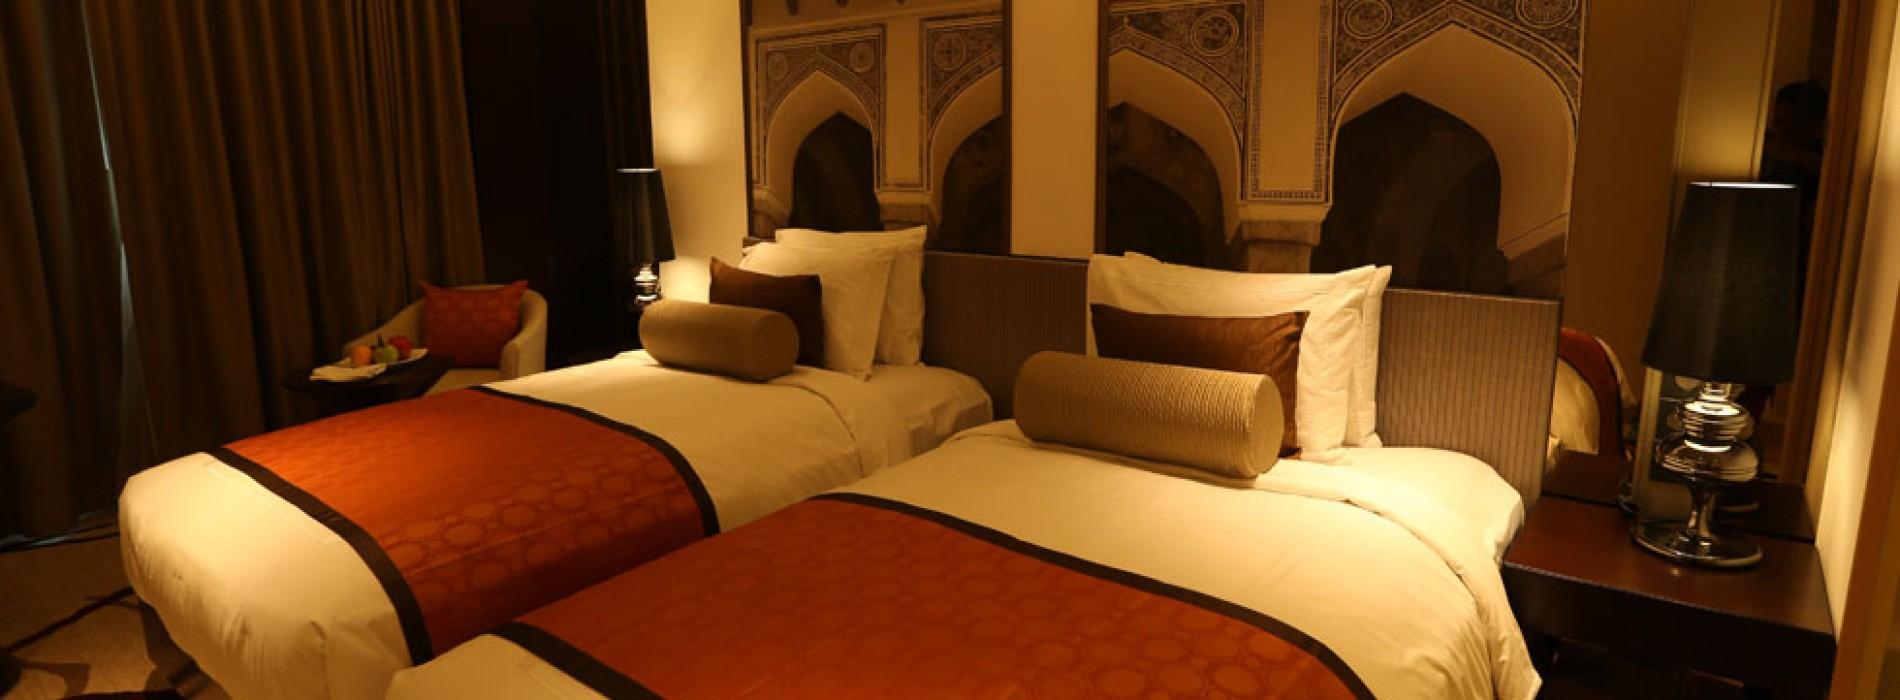 Pride Hotels launch its luxury hotel at Aerocity, New Delhi